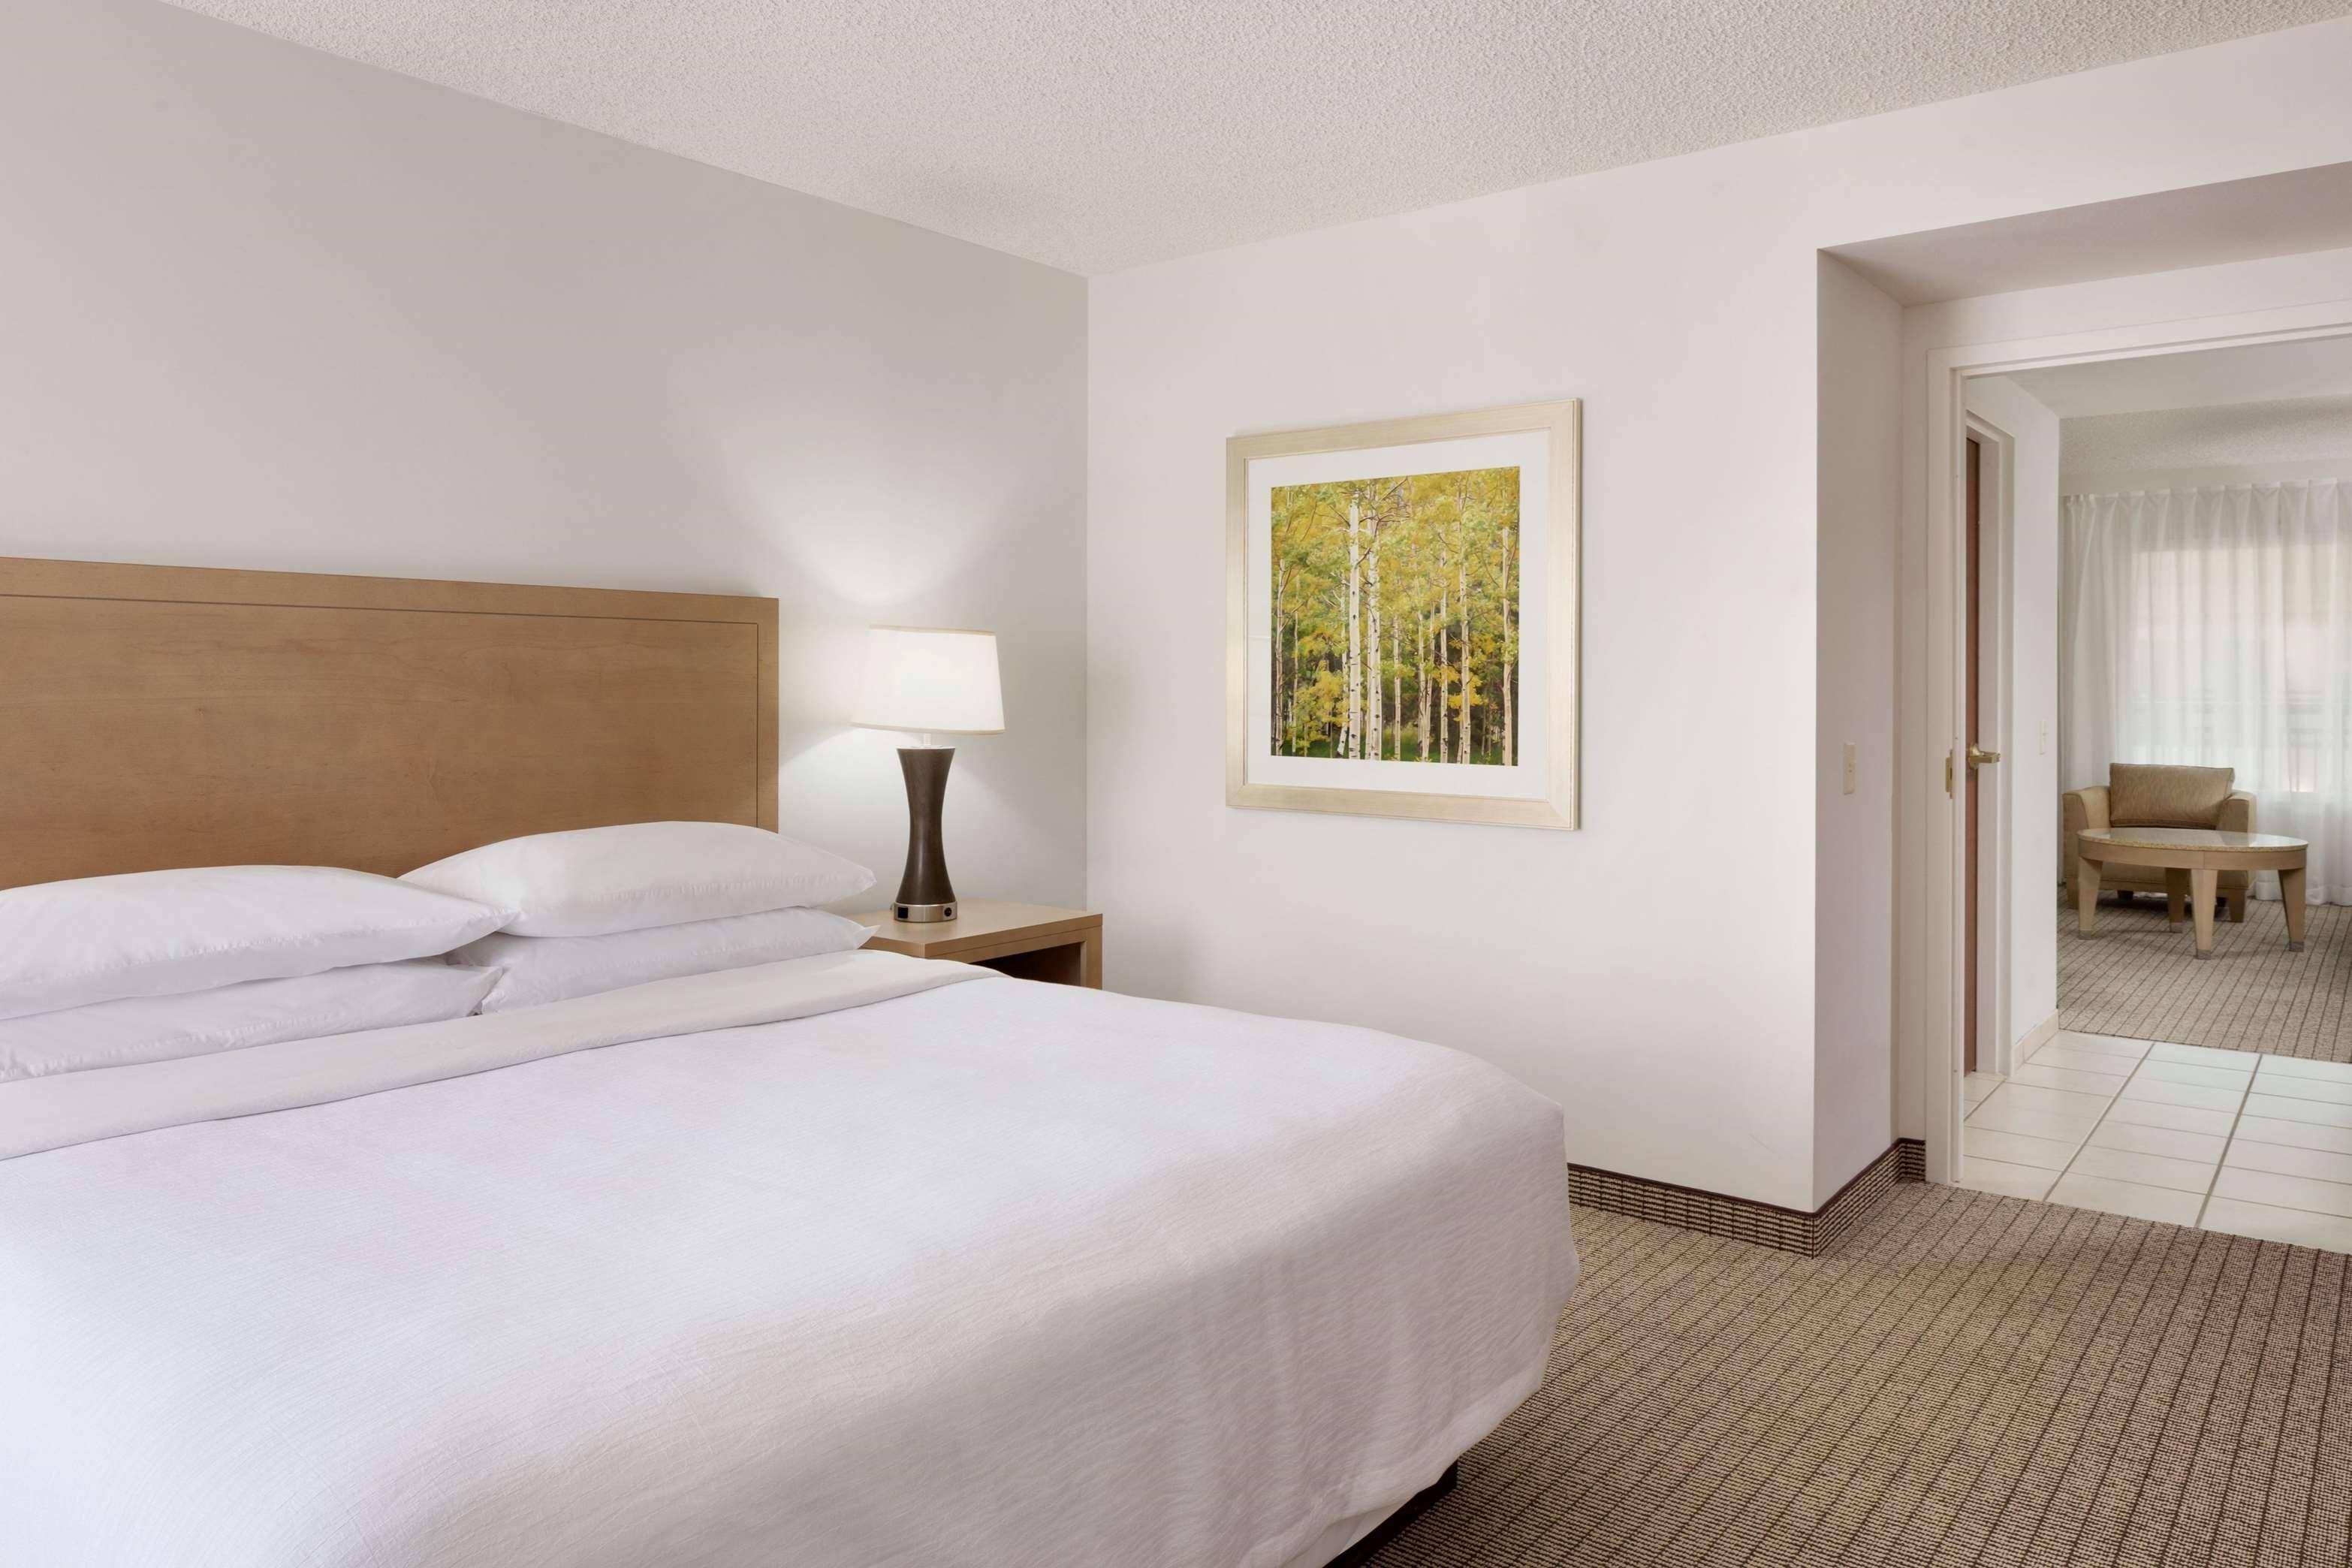 Embassy Suites by Hilton Denver International Airport image 27